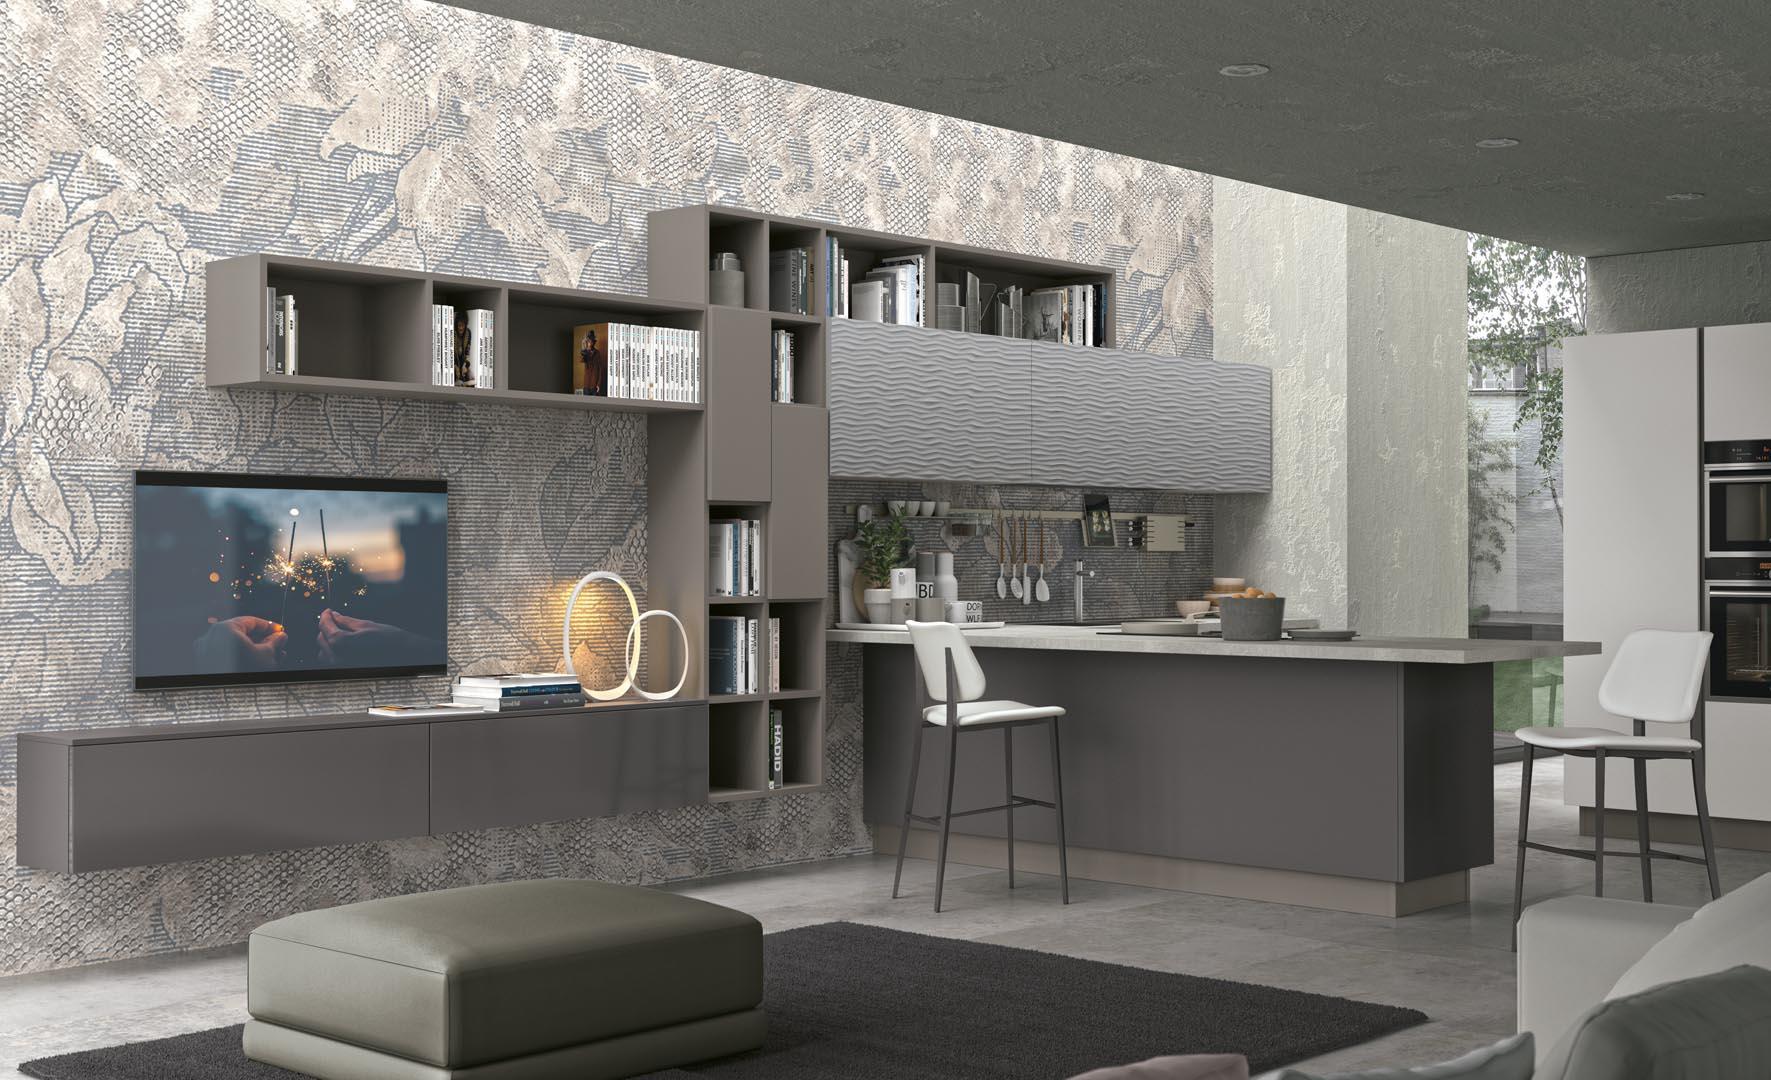 Ikea O Mondo Convenienza bali constructions – maribyrnong vic – 6 reviews